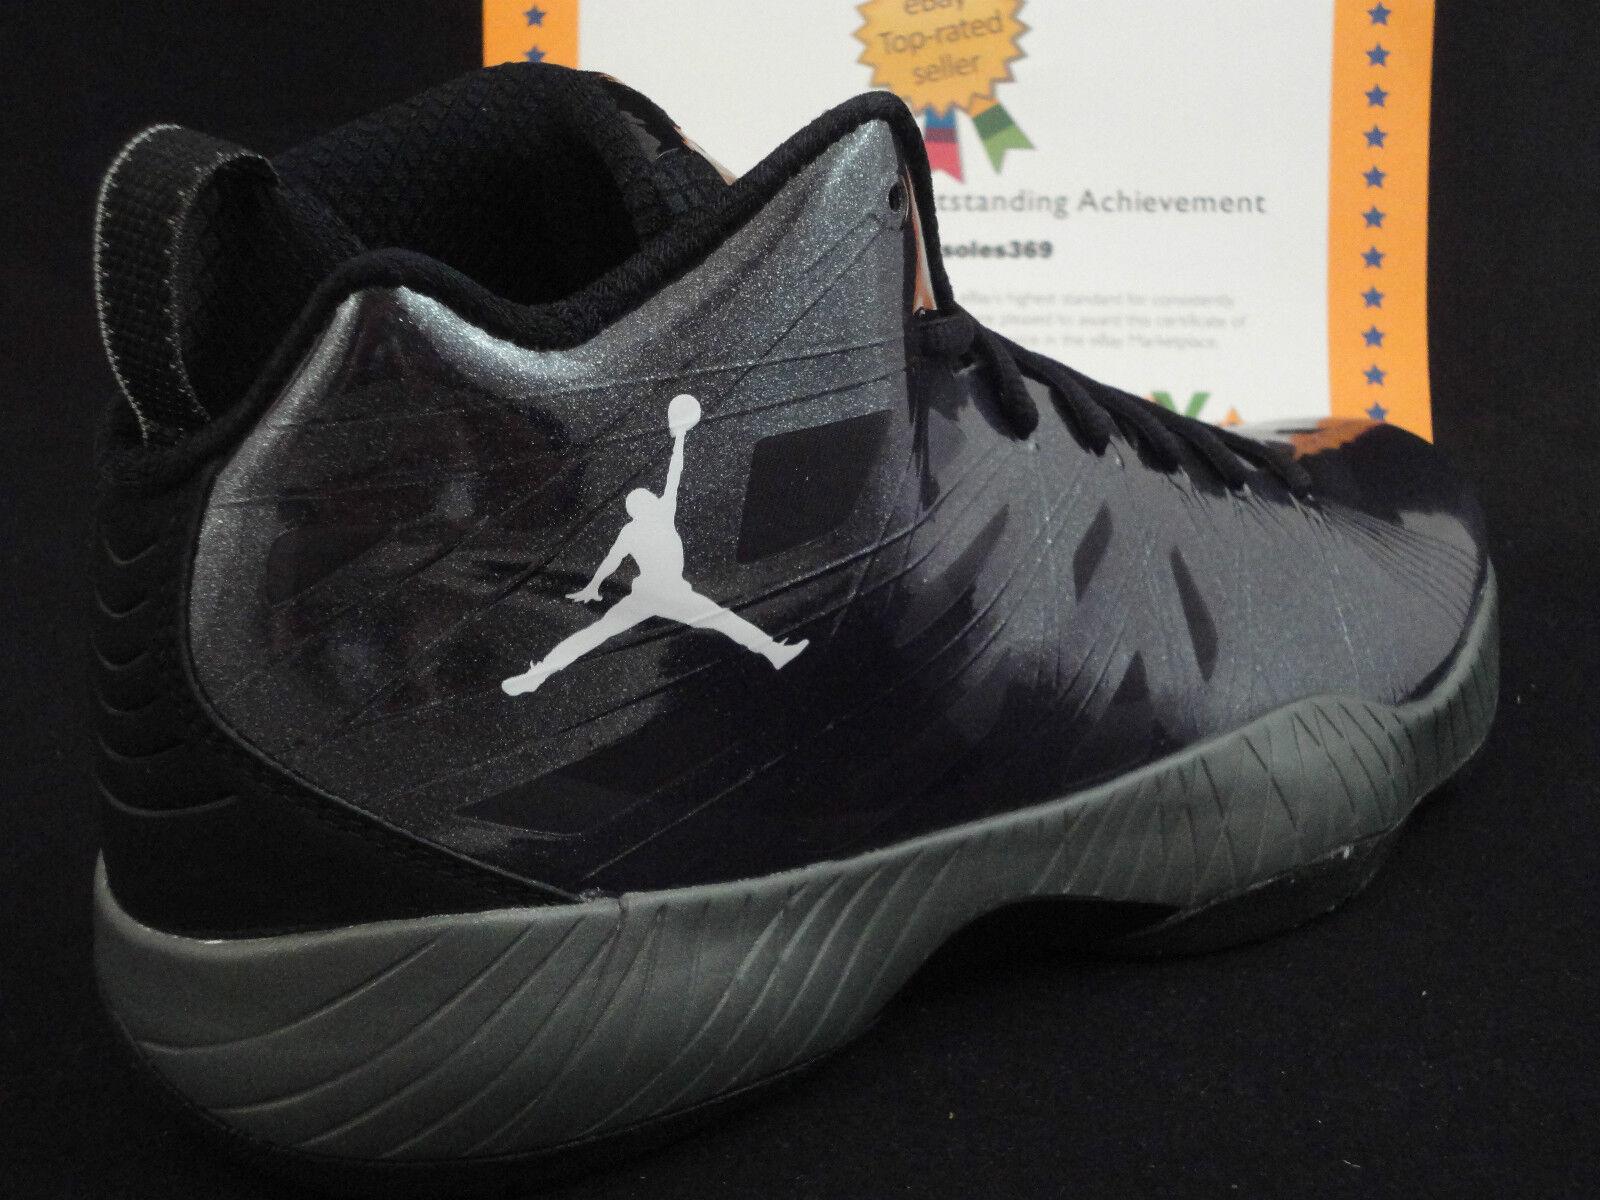 Nike Air Jordan 2018 Lite, Size 11.5, Flywire, DS, Retail 150